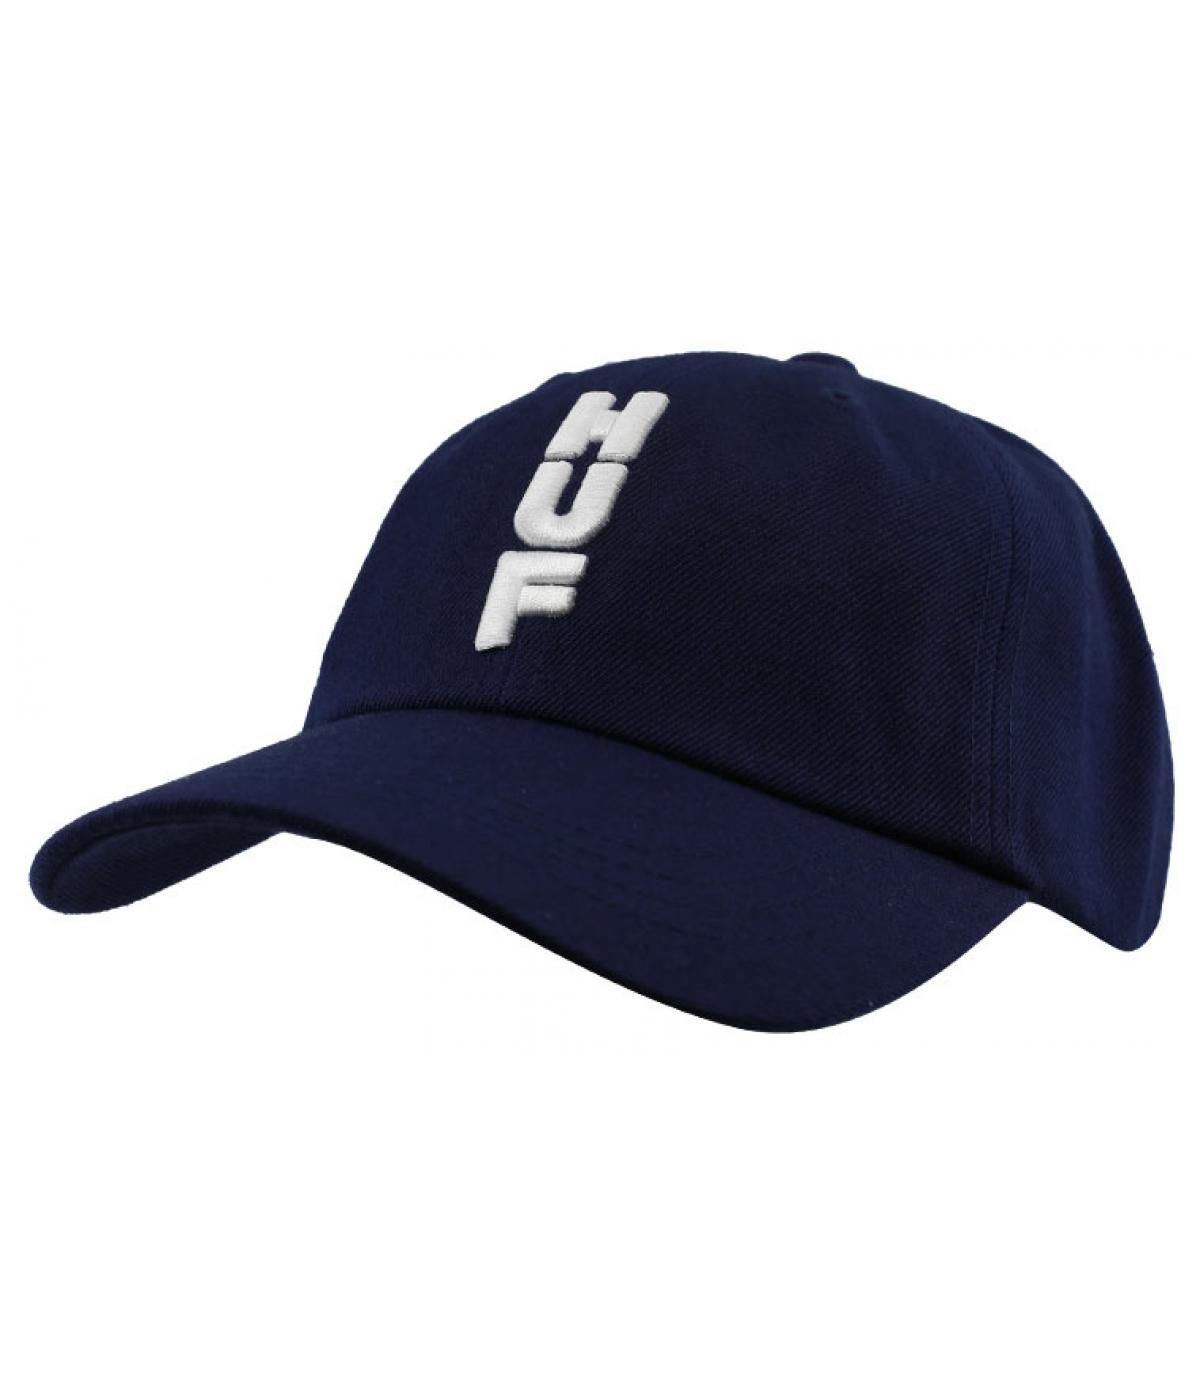 casquette Huf bleu blanc